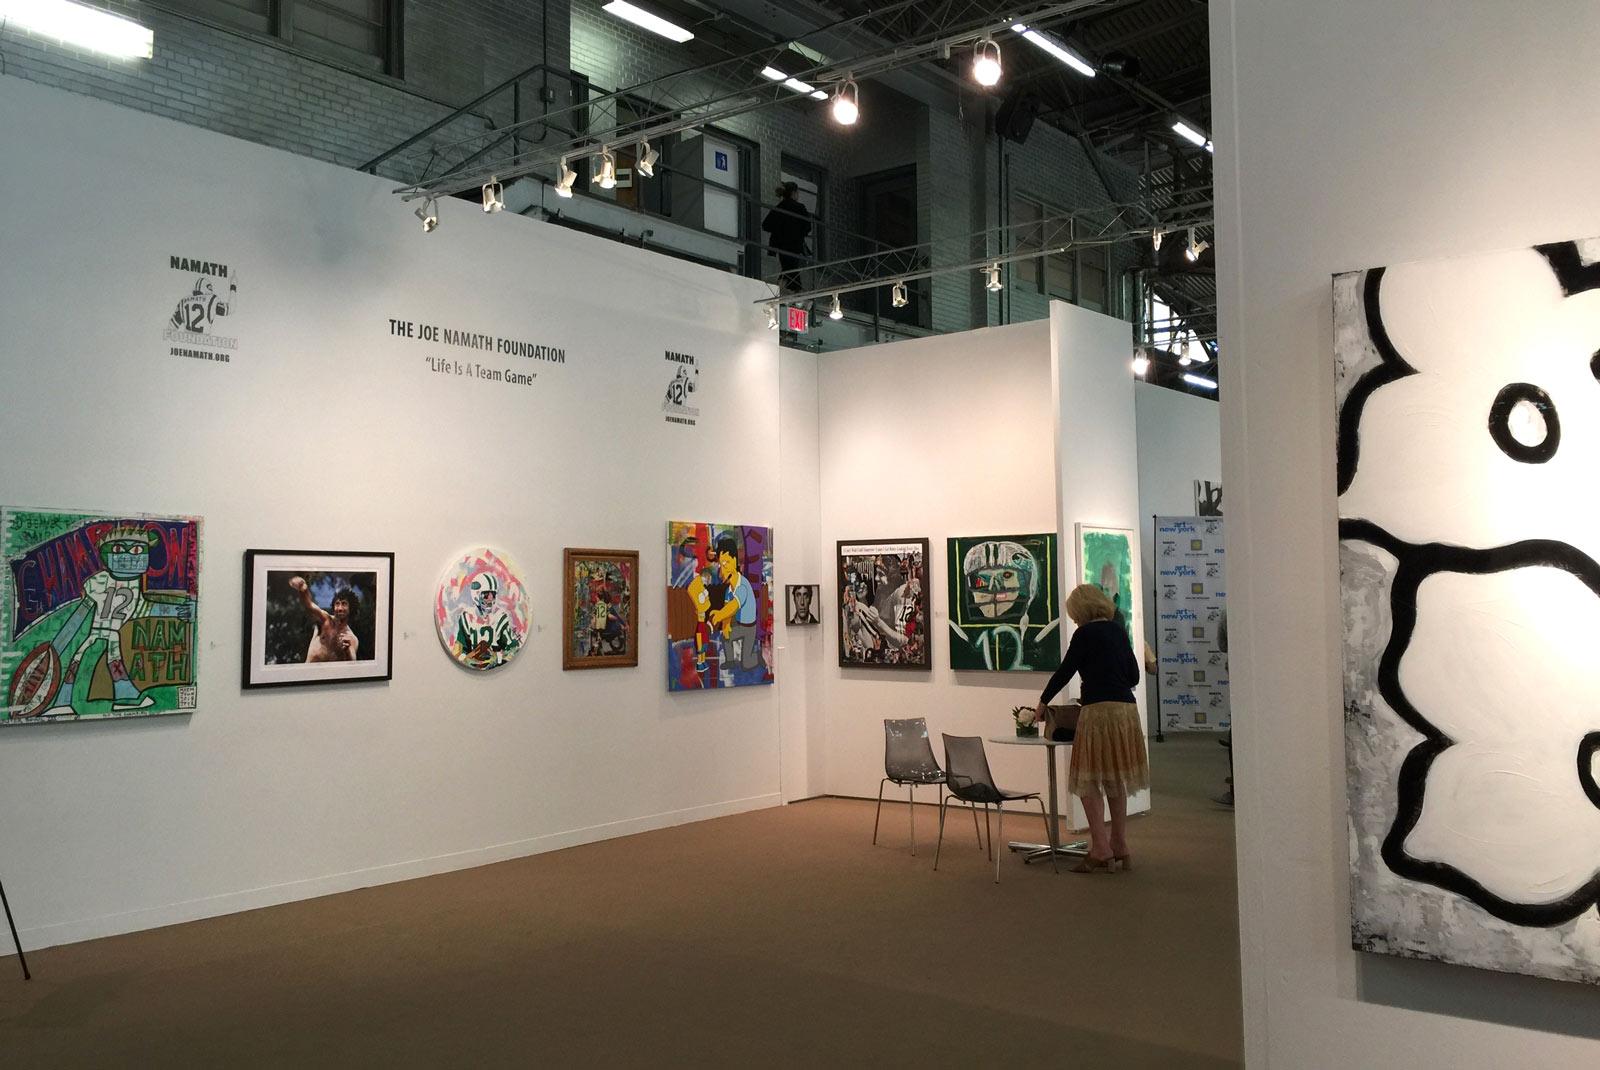 Art-New-York-Expo-Pier-94-Joe-Namath-Foundation.jpg